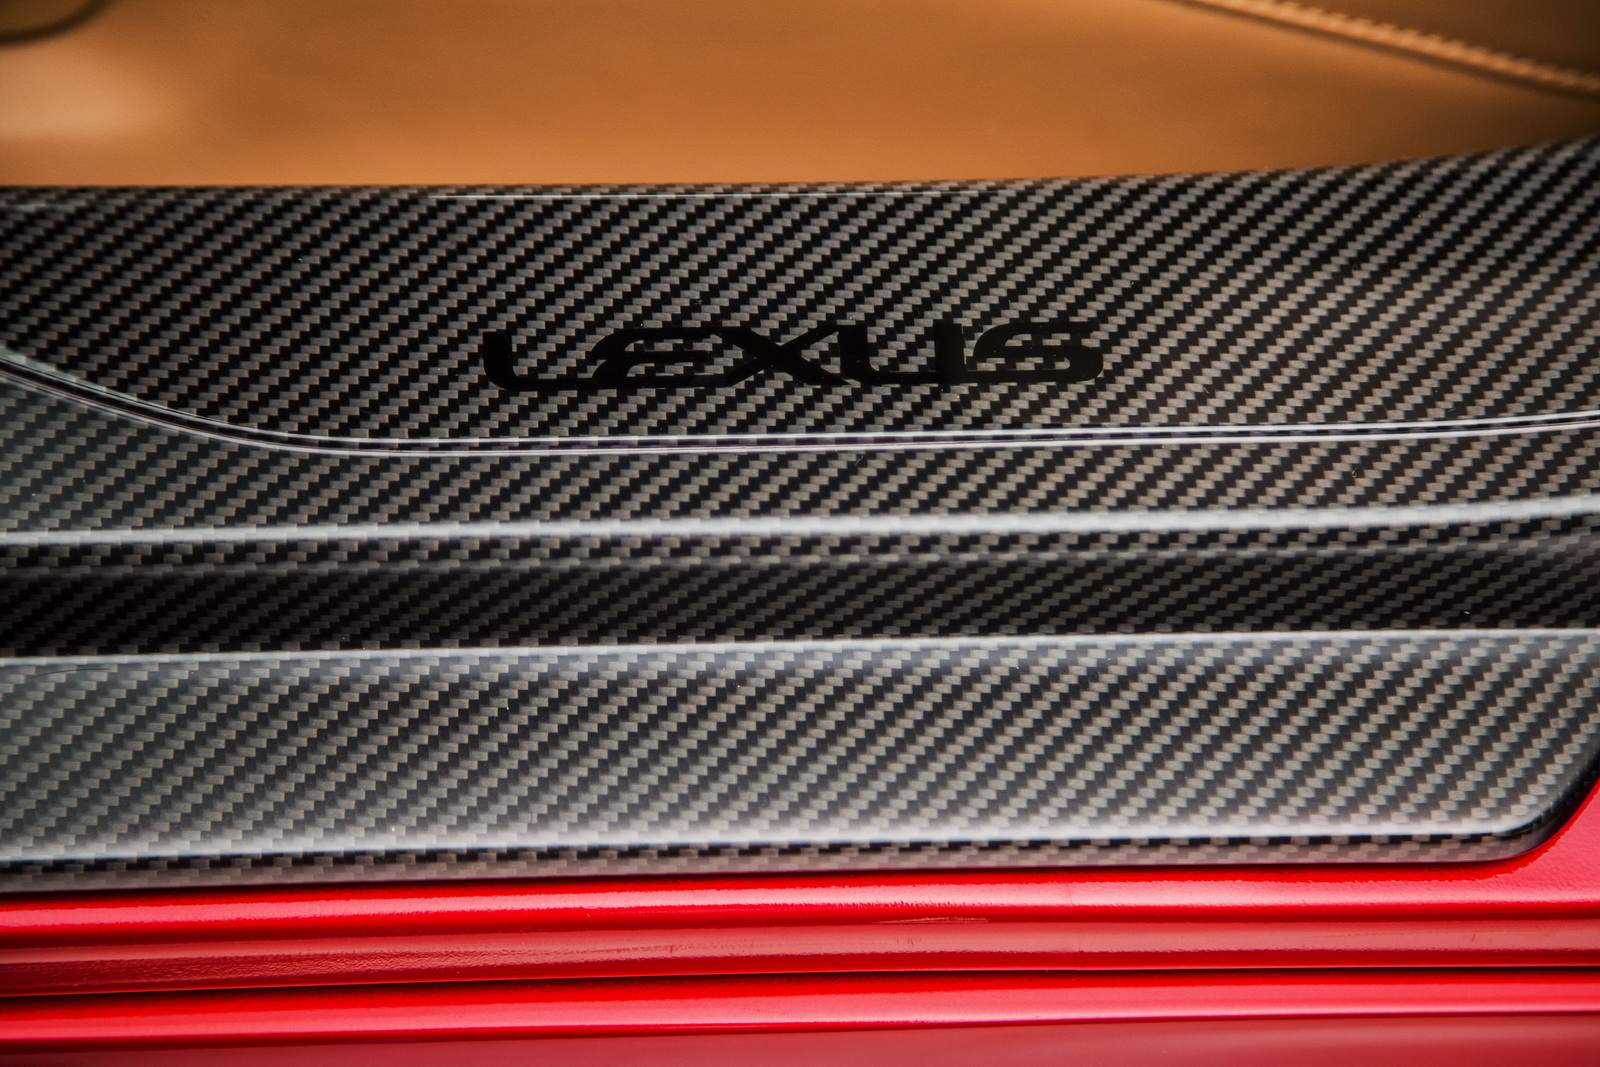 2017-lexus-lc-500-28